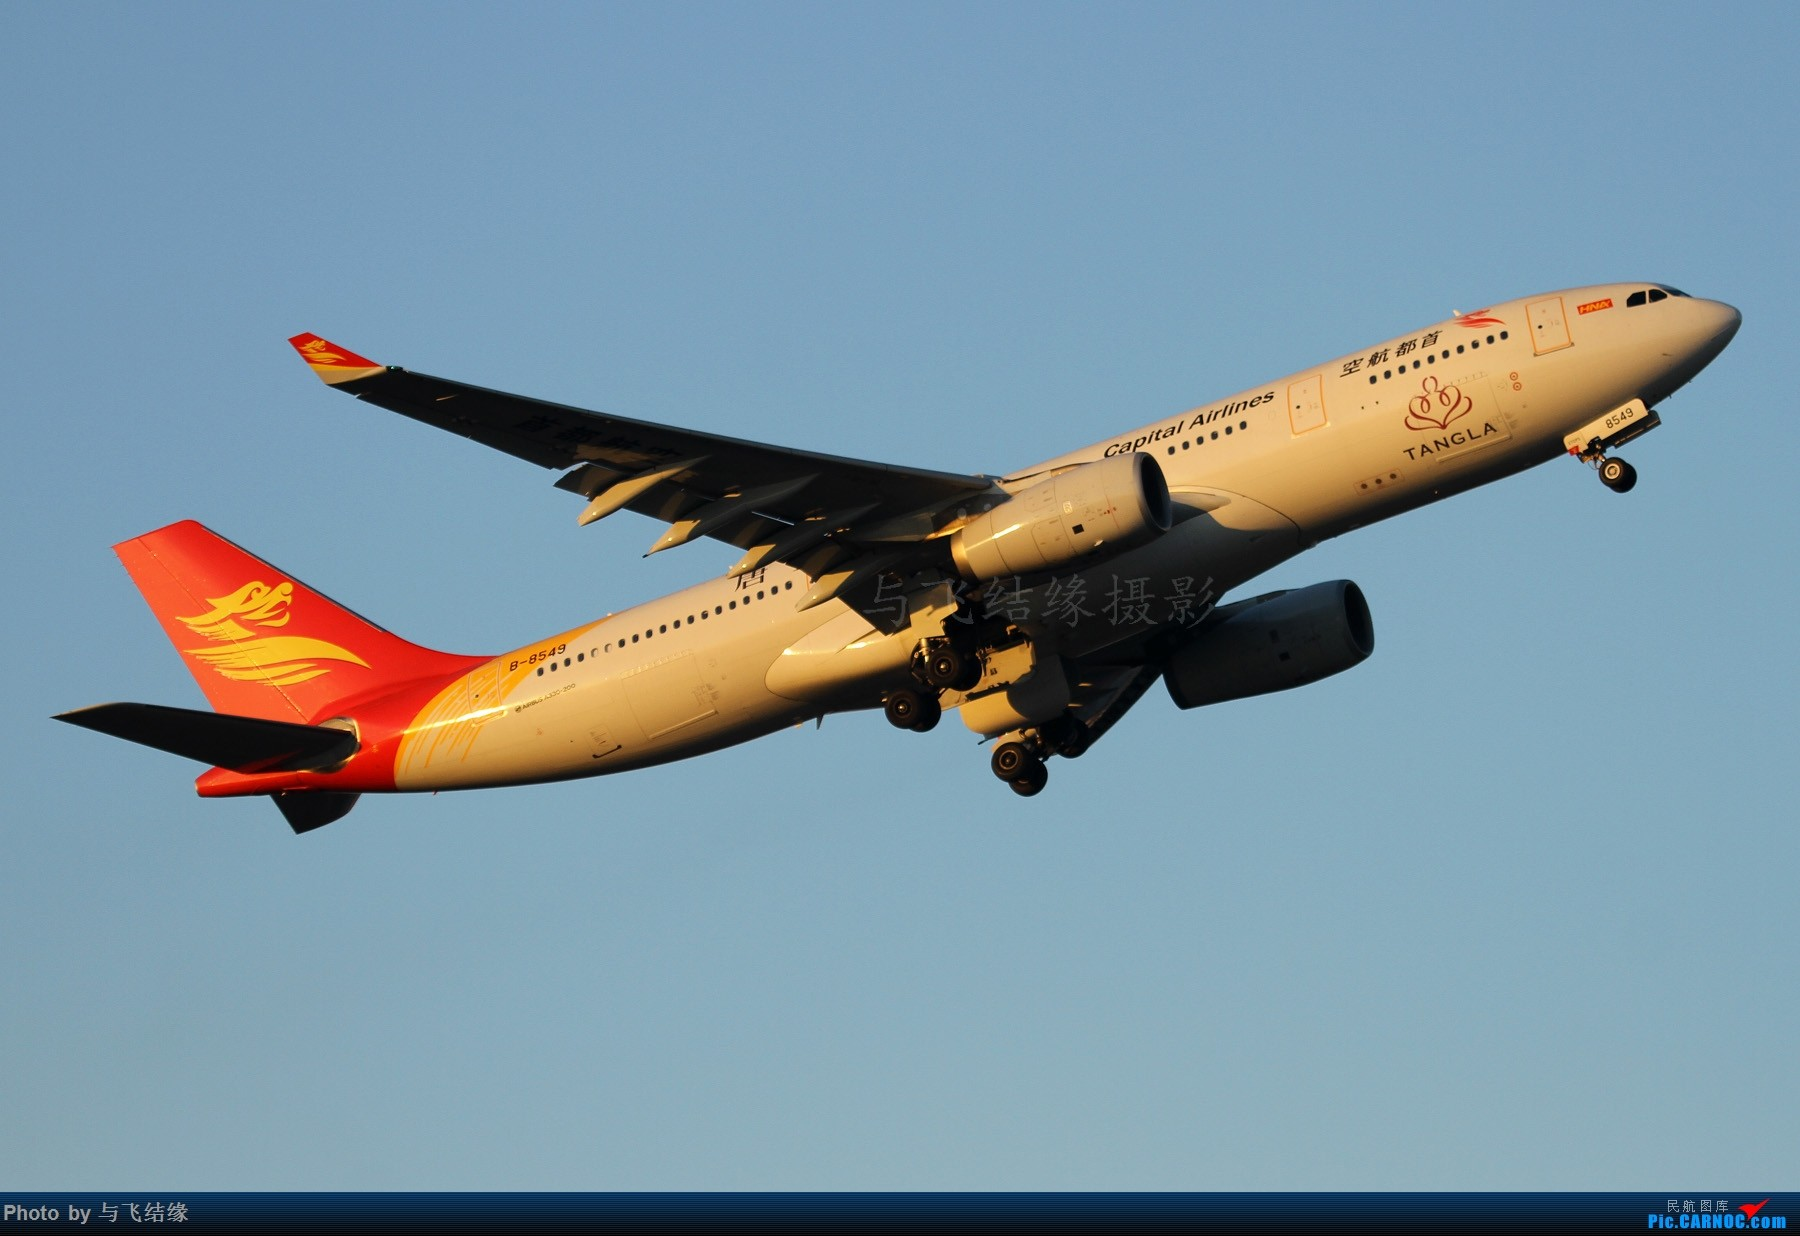 "Re:[原创]""早起的鸟儿有虫吃""祥鹏航空,美佳航空,土库曼斯坦航空等! AIRBUS A330-200 B-8549 中国北京首都国际机场"